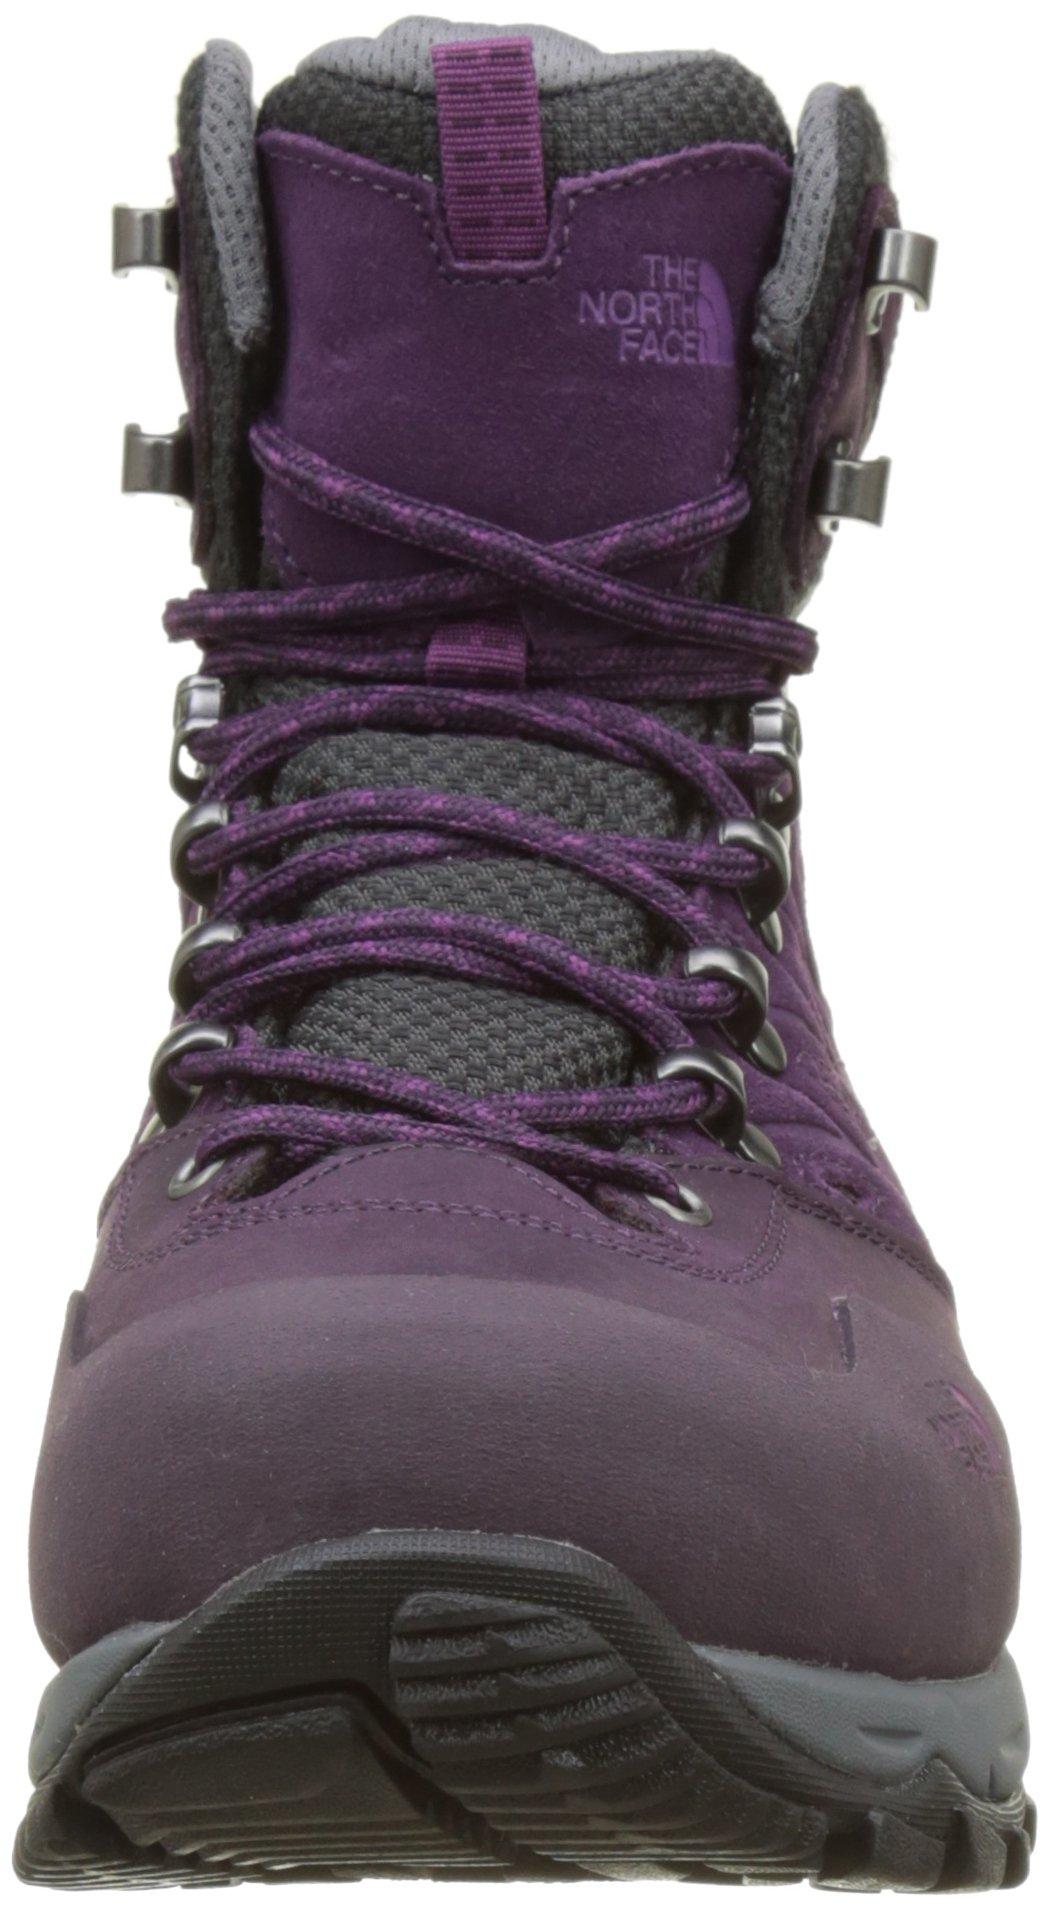 08eff5d8e THE NORTH FACE Women's Hedgehog Trek Gore-tex High Rise Hiking Boots ...